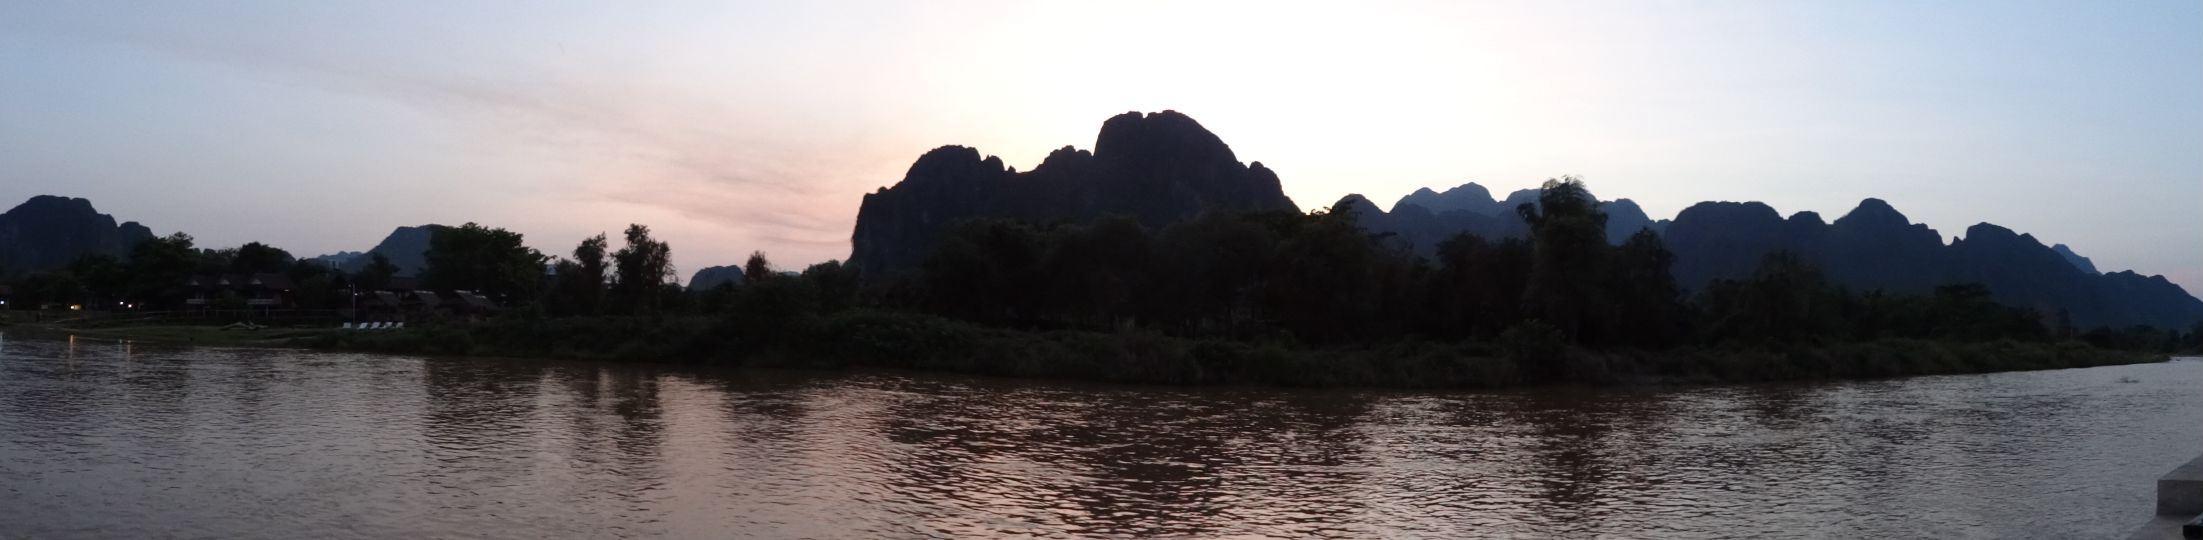 Laos - Van Vieng